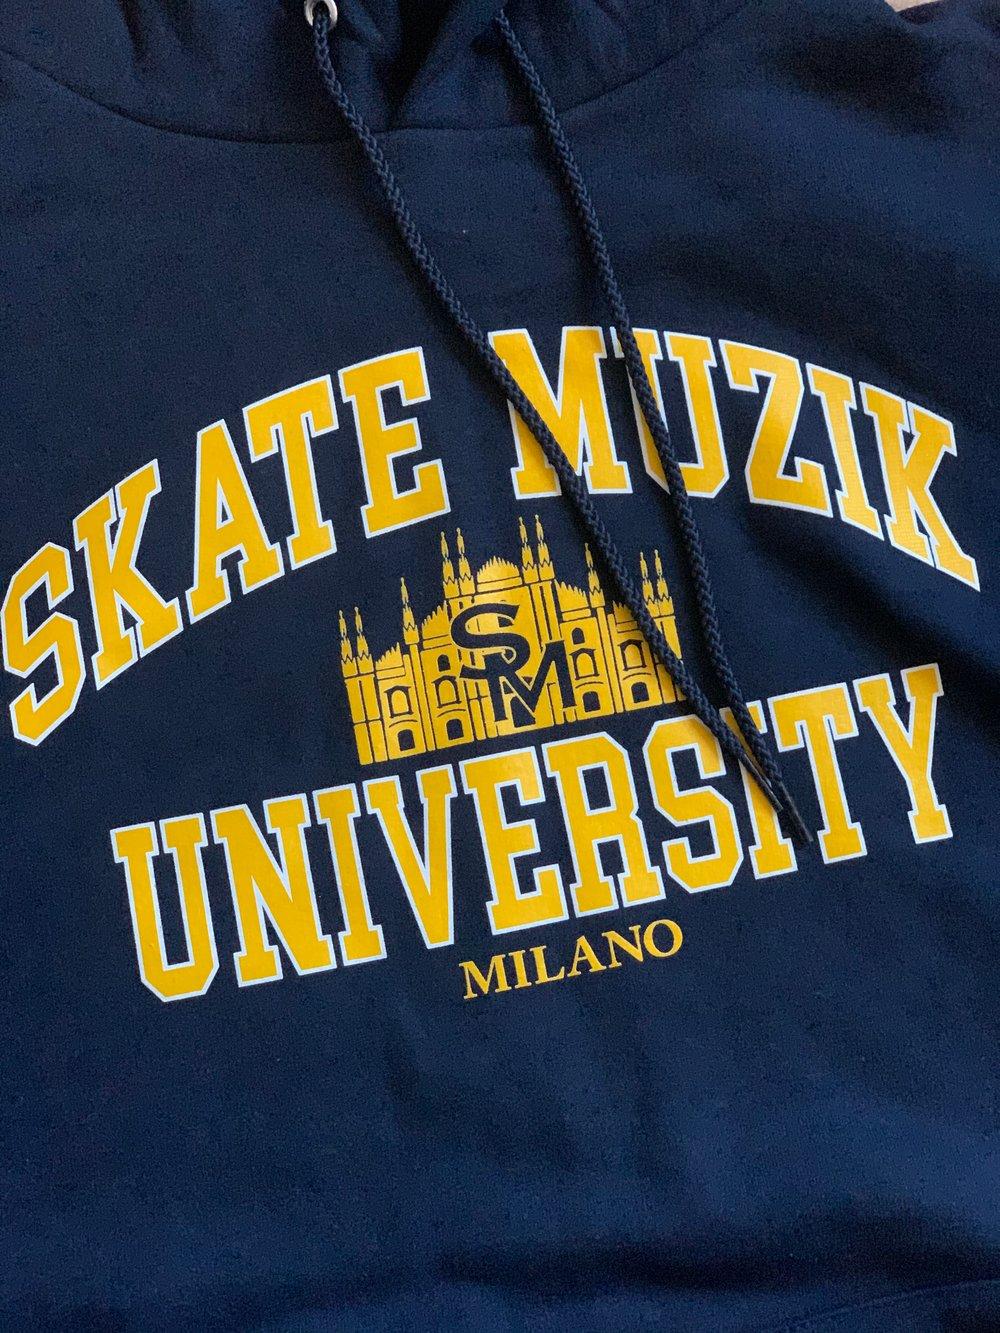 Image of Skate Muzik University hoodie